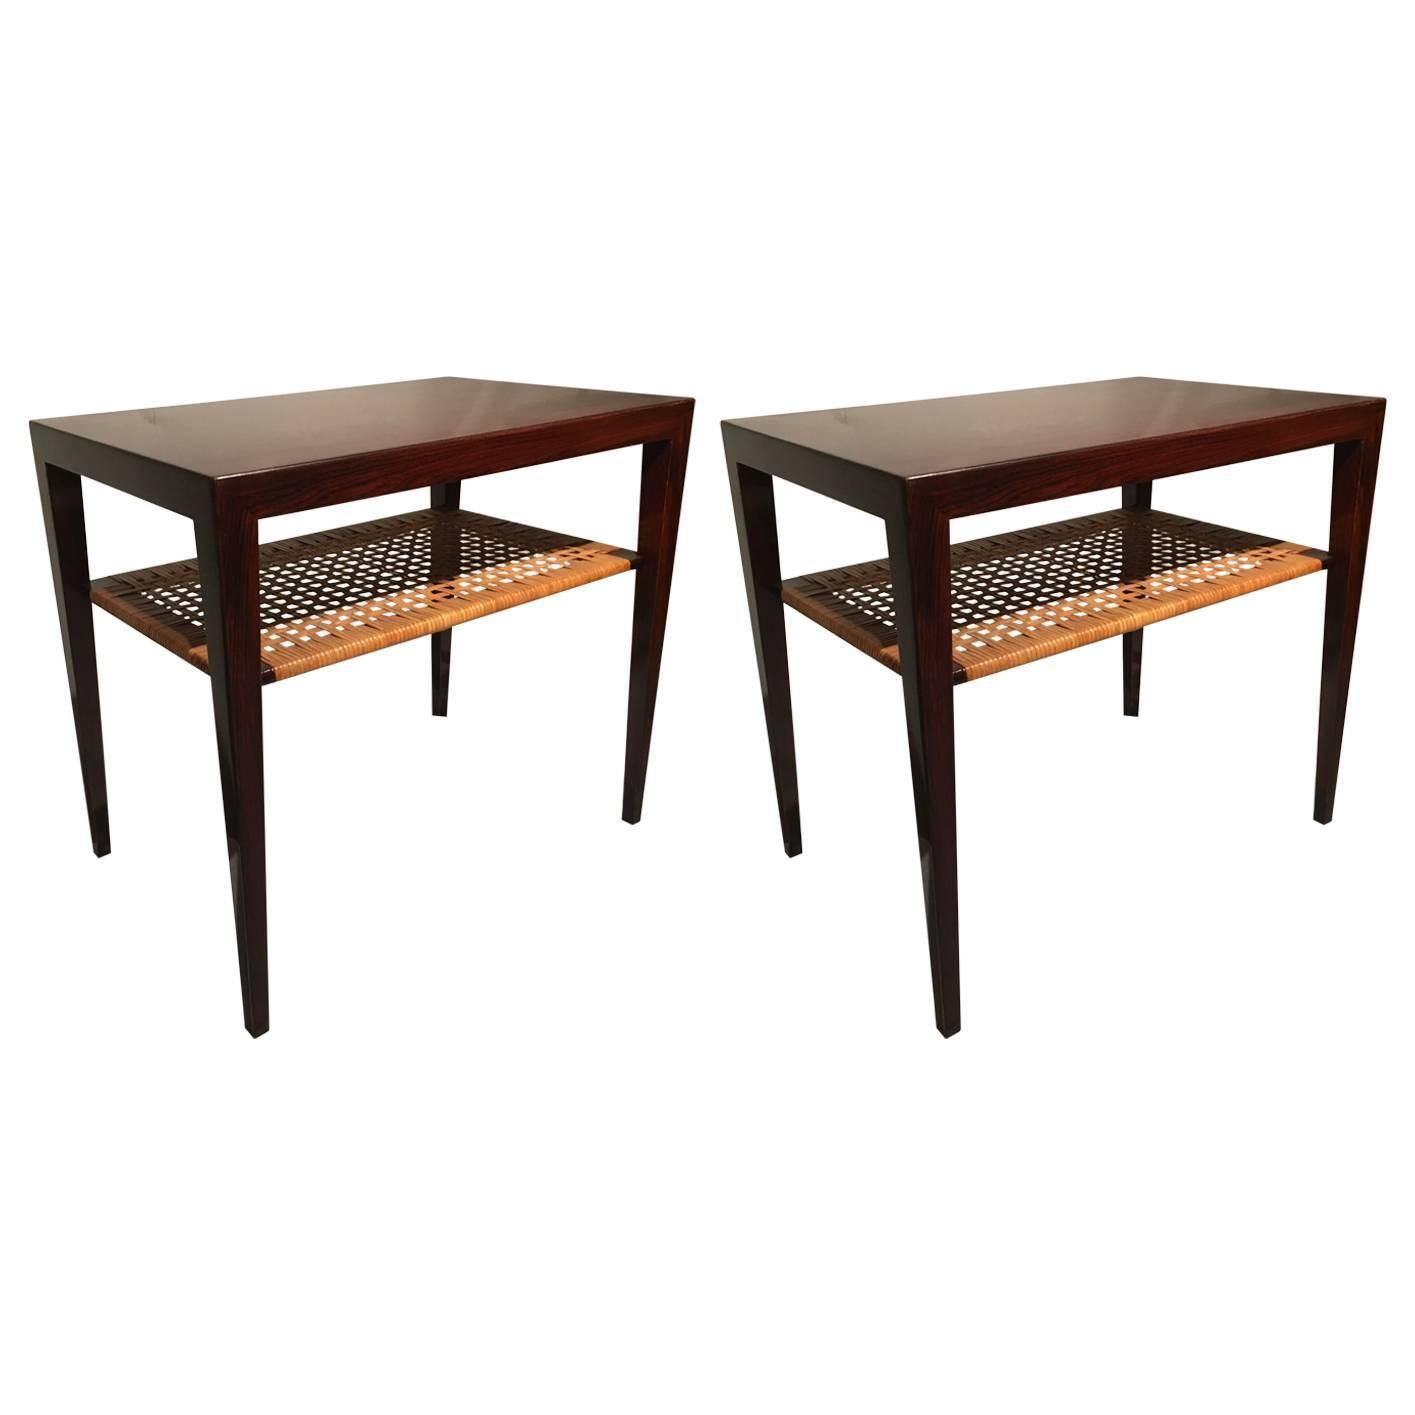 ba1b70e95b4a5c477ac3c7ba0fcc38b9 Unique De Table Basse Noyer Design Concept